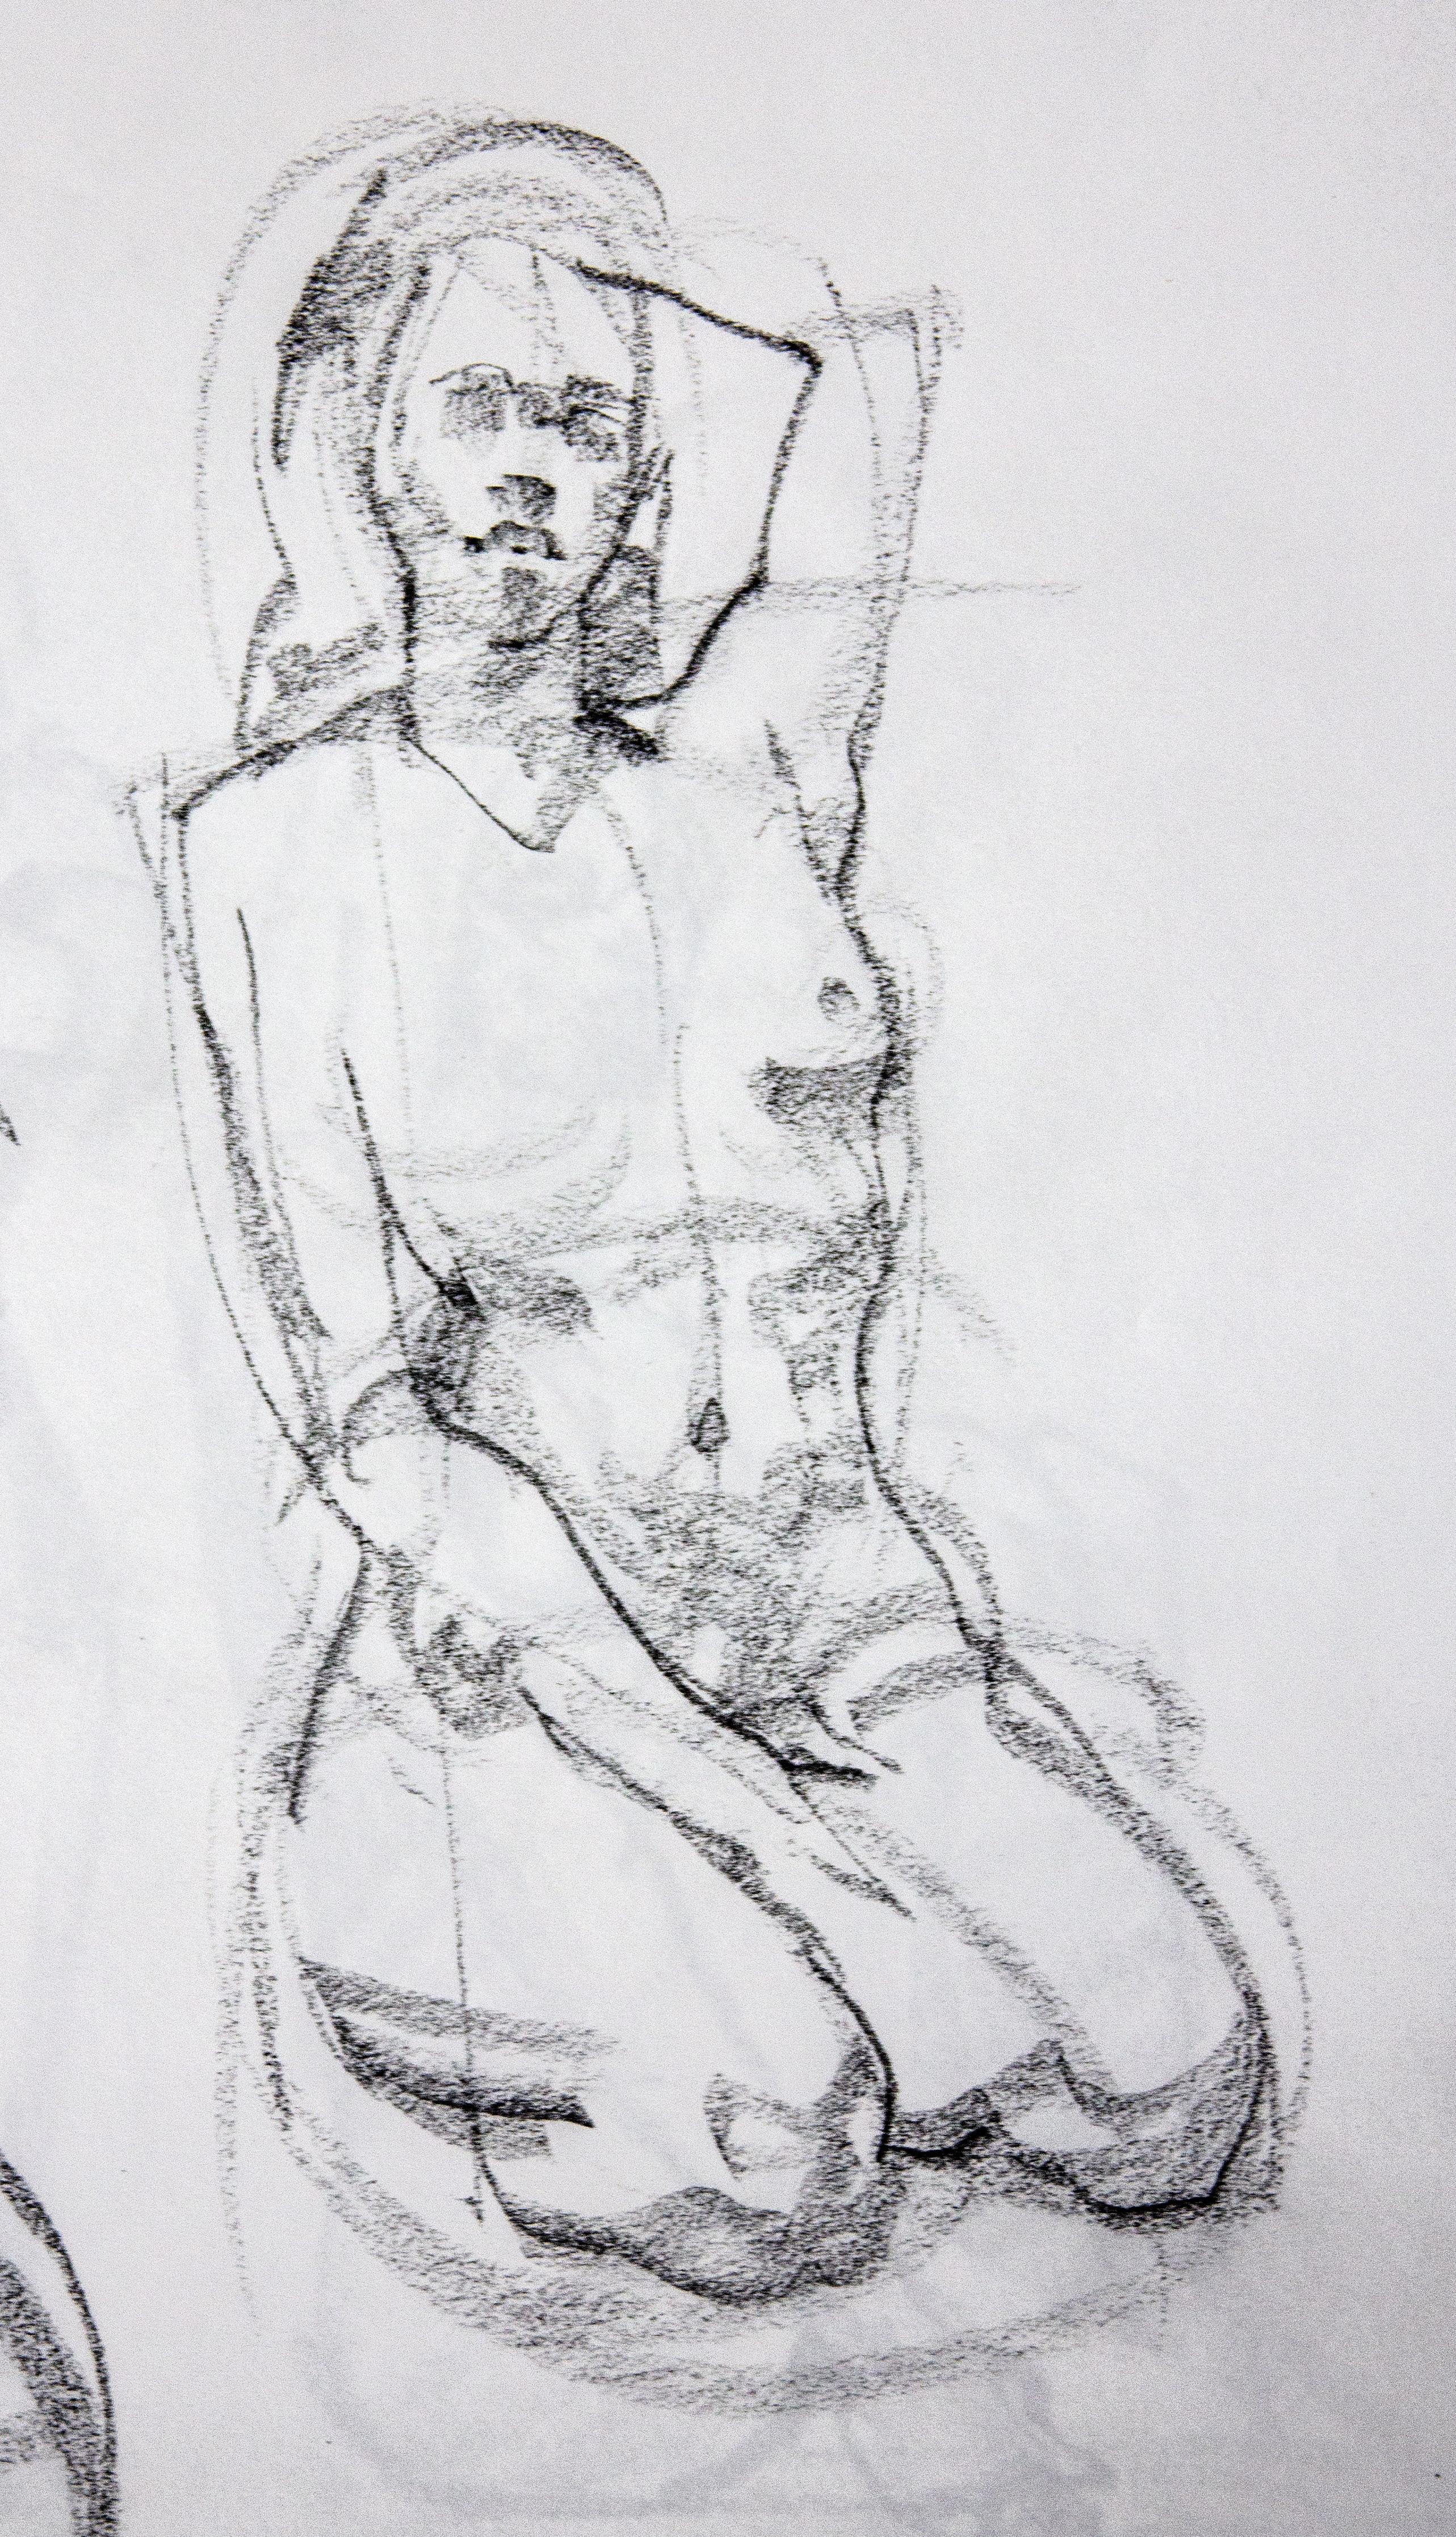 Gesture Female Model - Charcoal